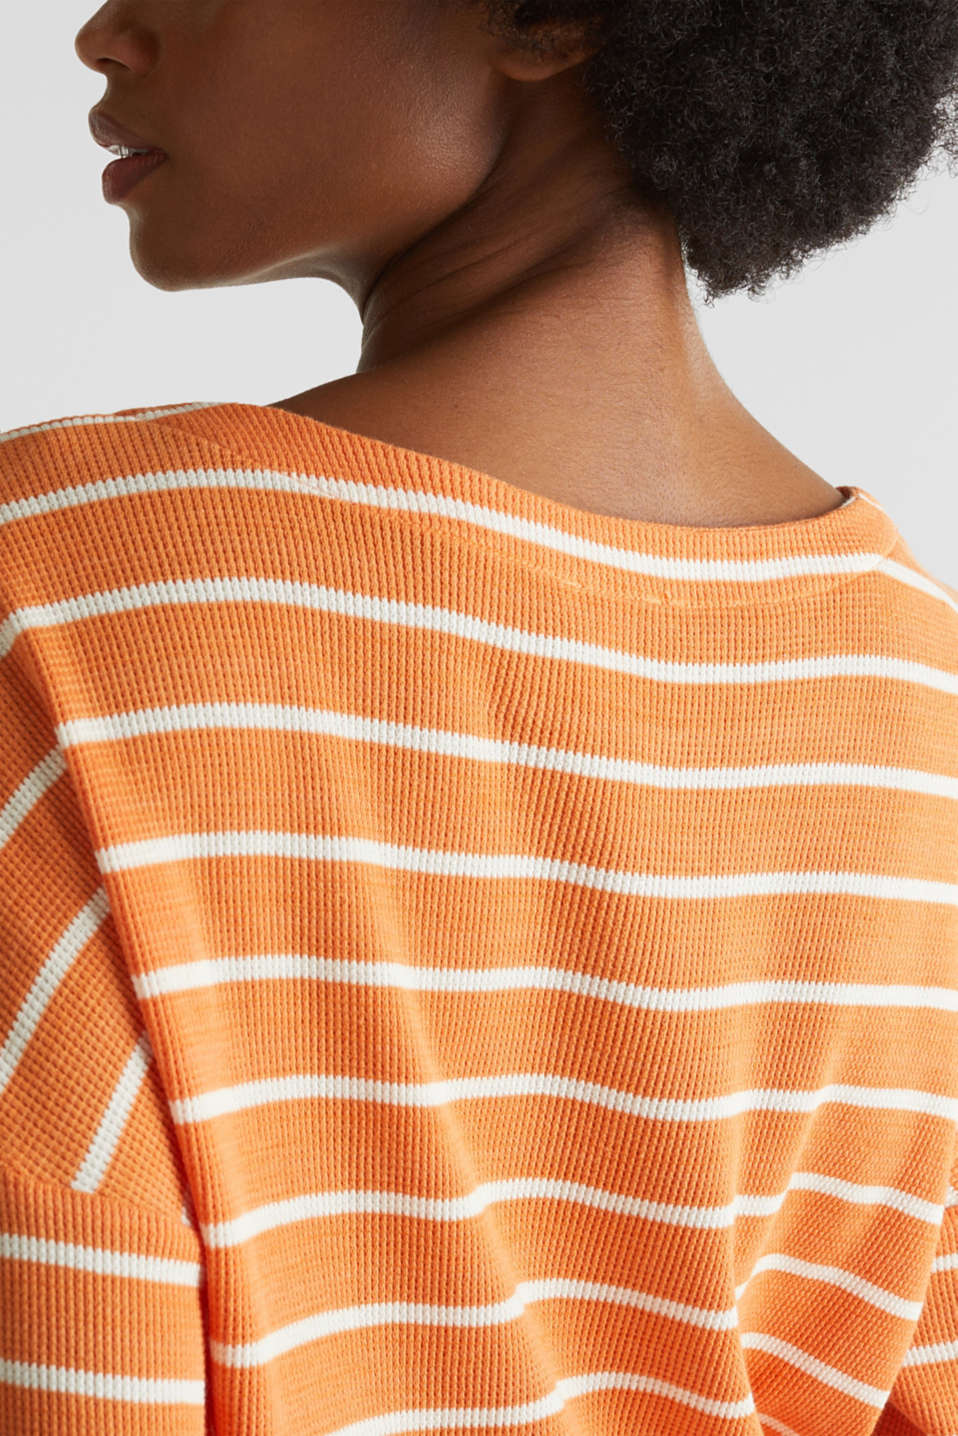 Piqué T-shirt in 100% cotton, RUST ORANGE, detail image number 6